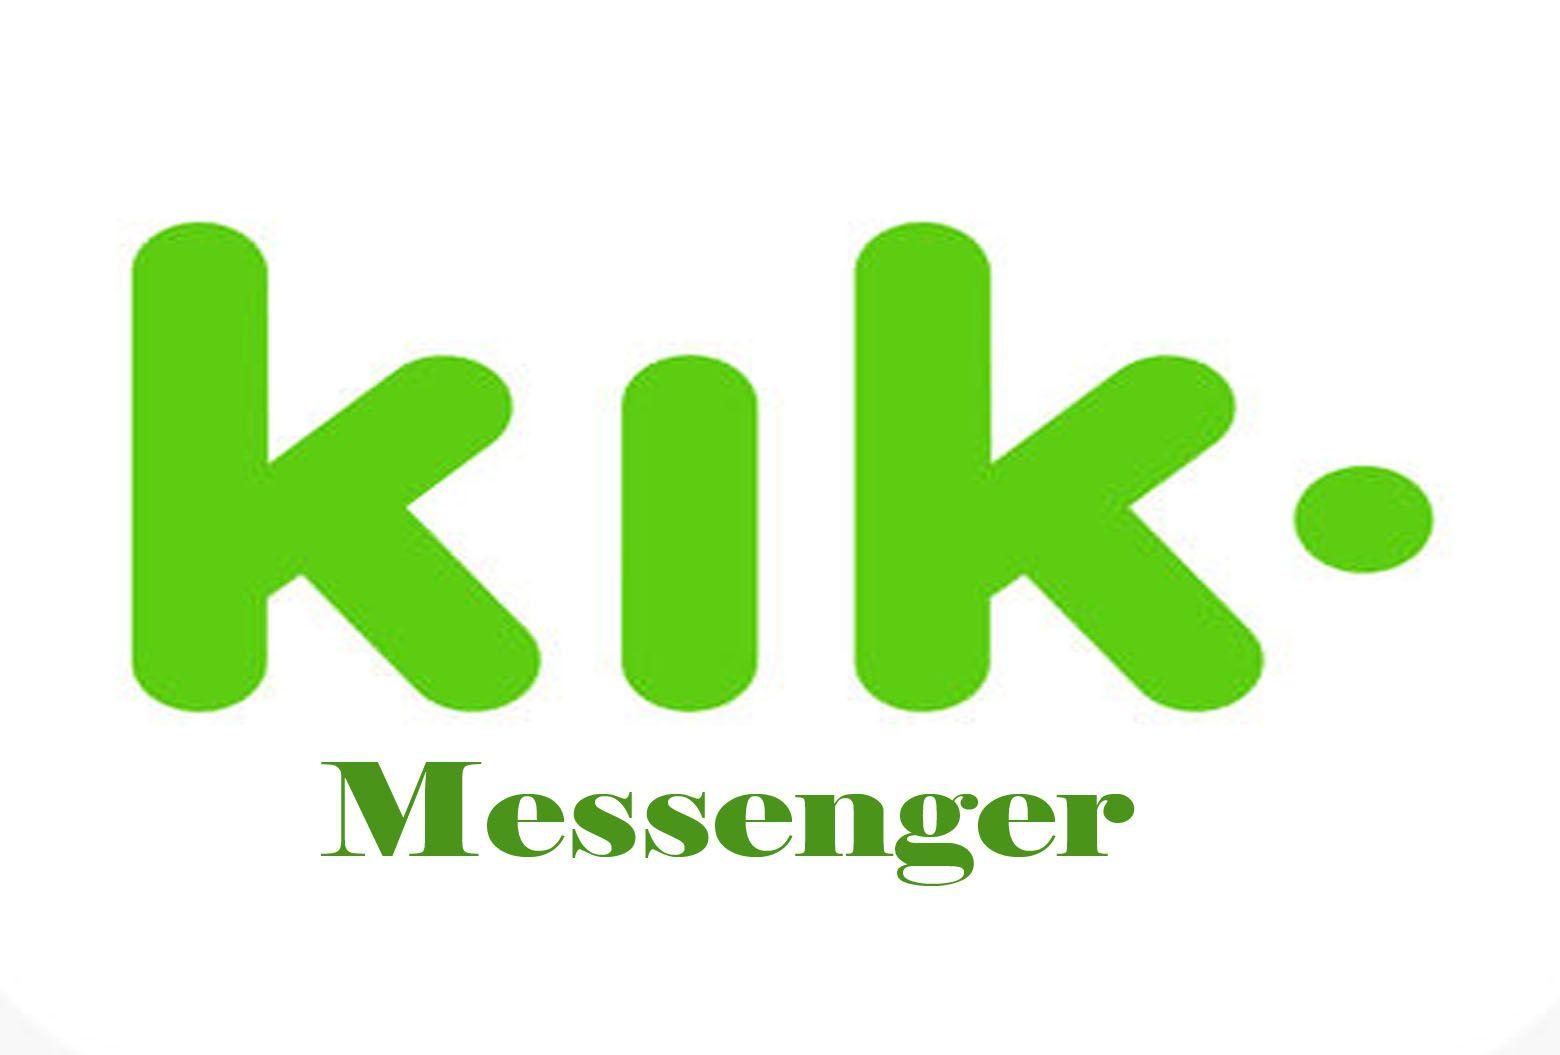 KIK Messenger How to Download the KIK Messenger App